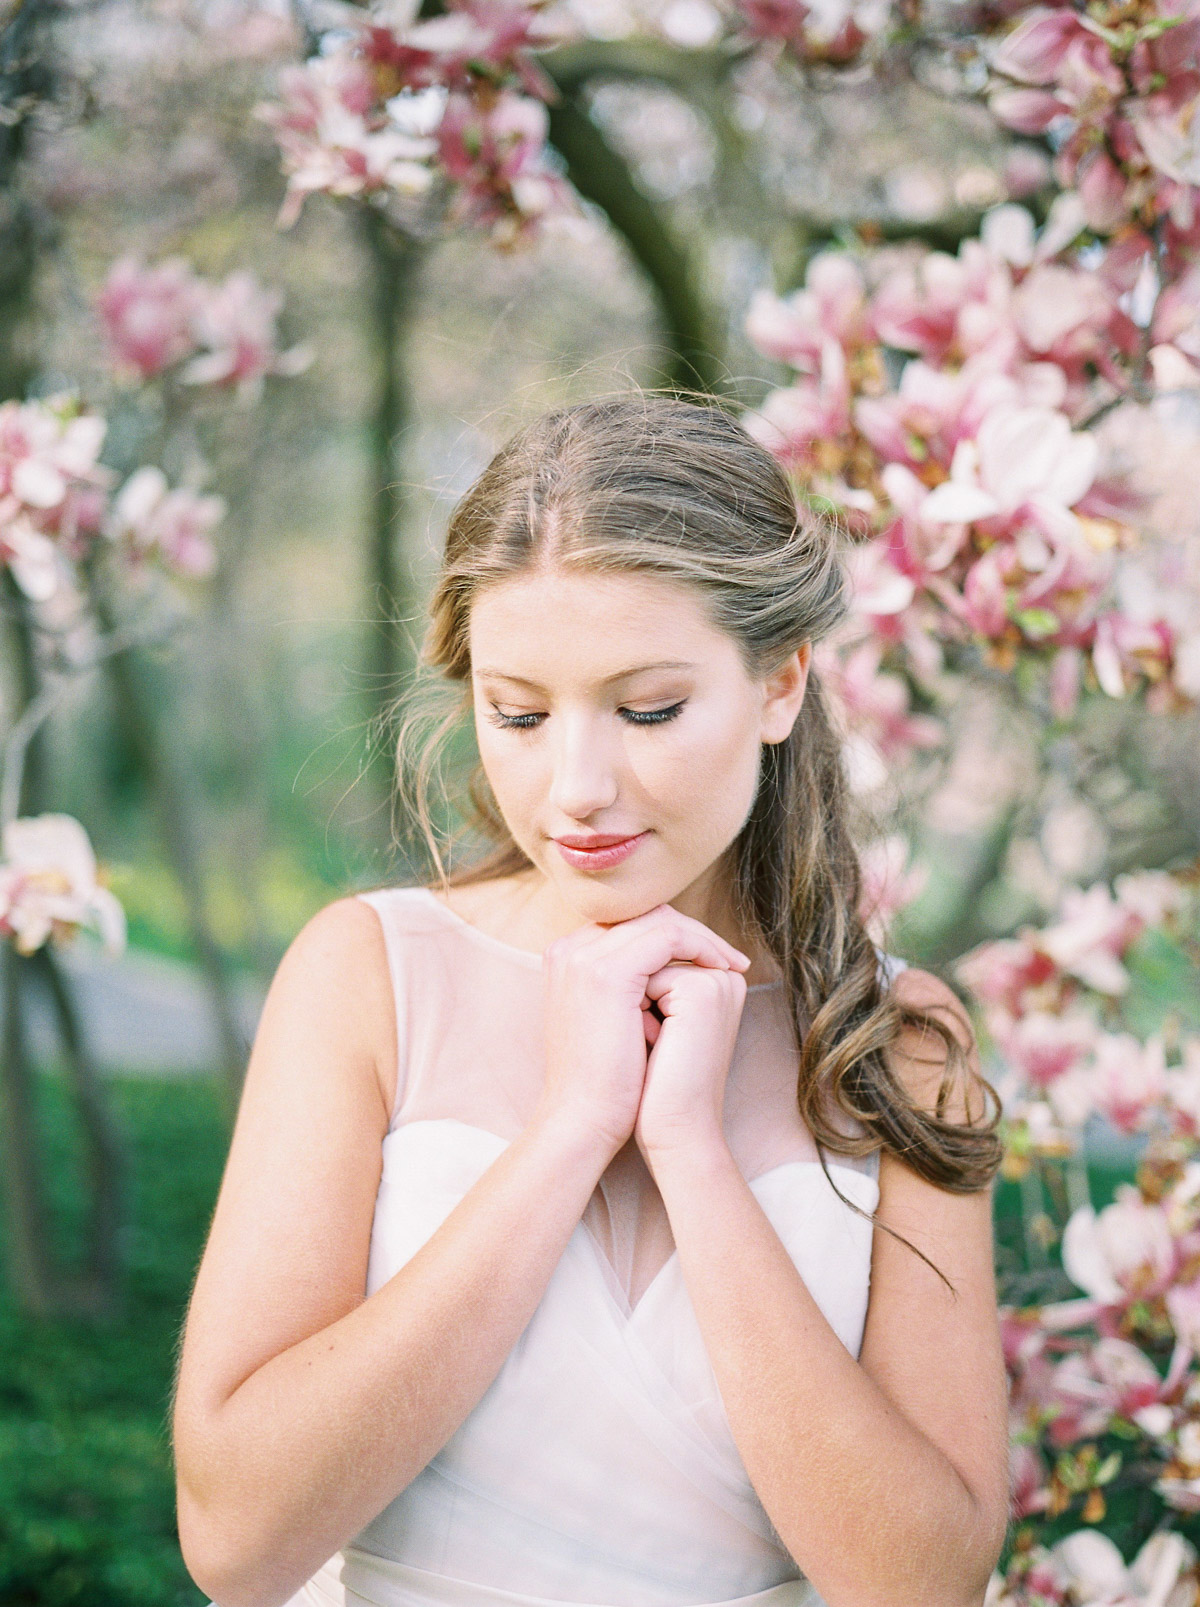 julia-park-photography-vineyard-bride-swish-list-niagara-on-the-lake-wedding-editorial-4.jpg